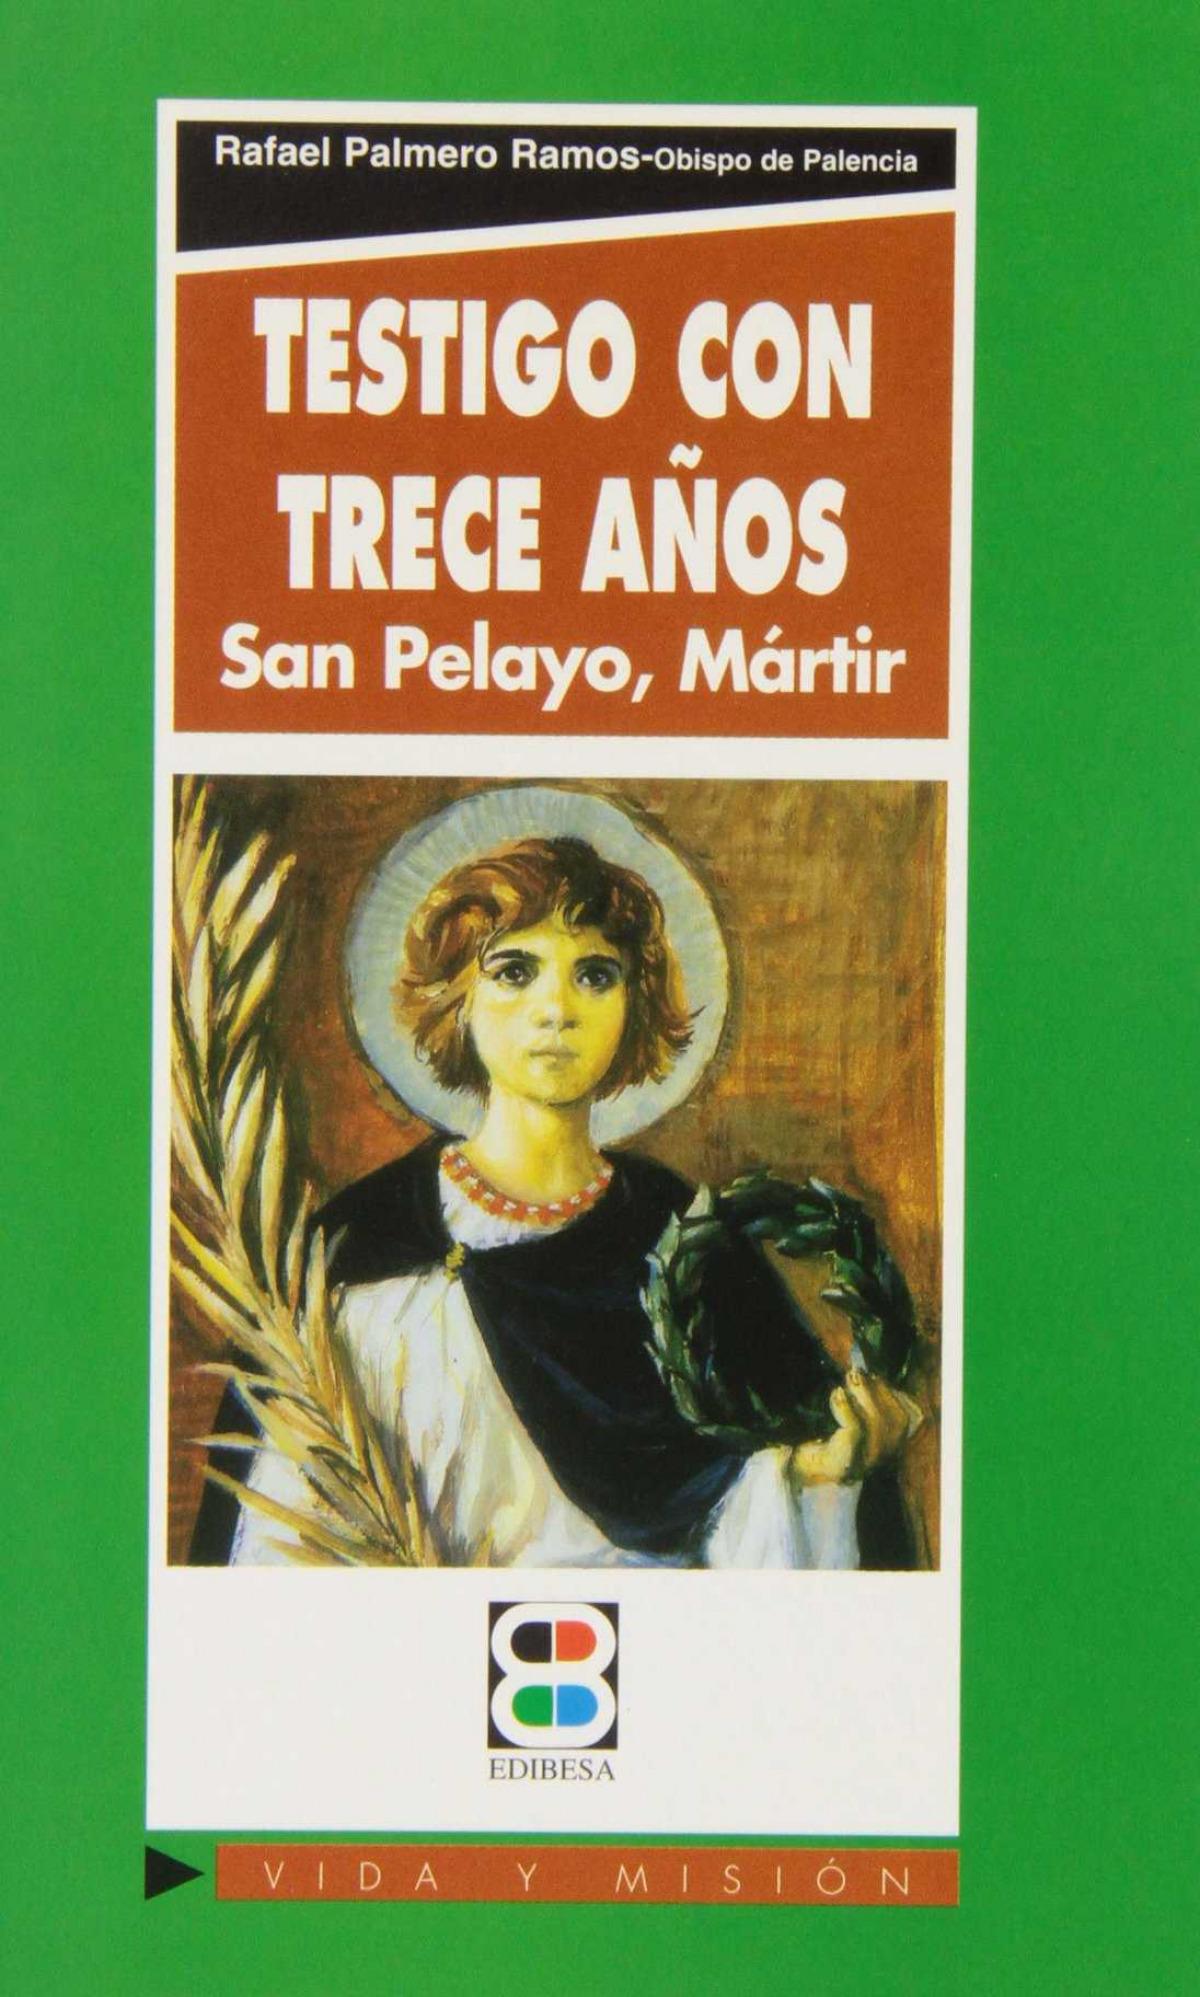 Testigo con trece años: San Pelayo